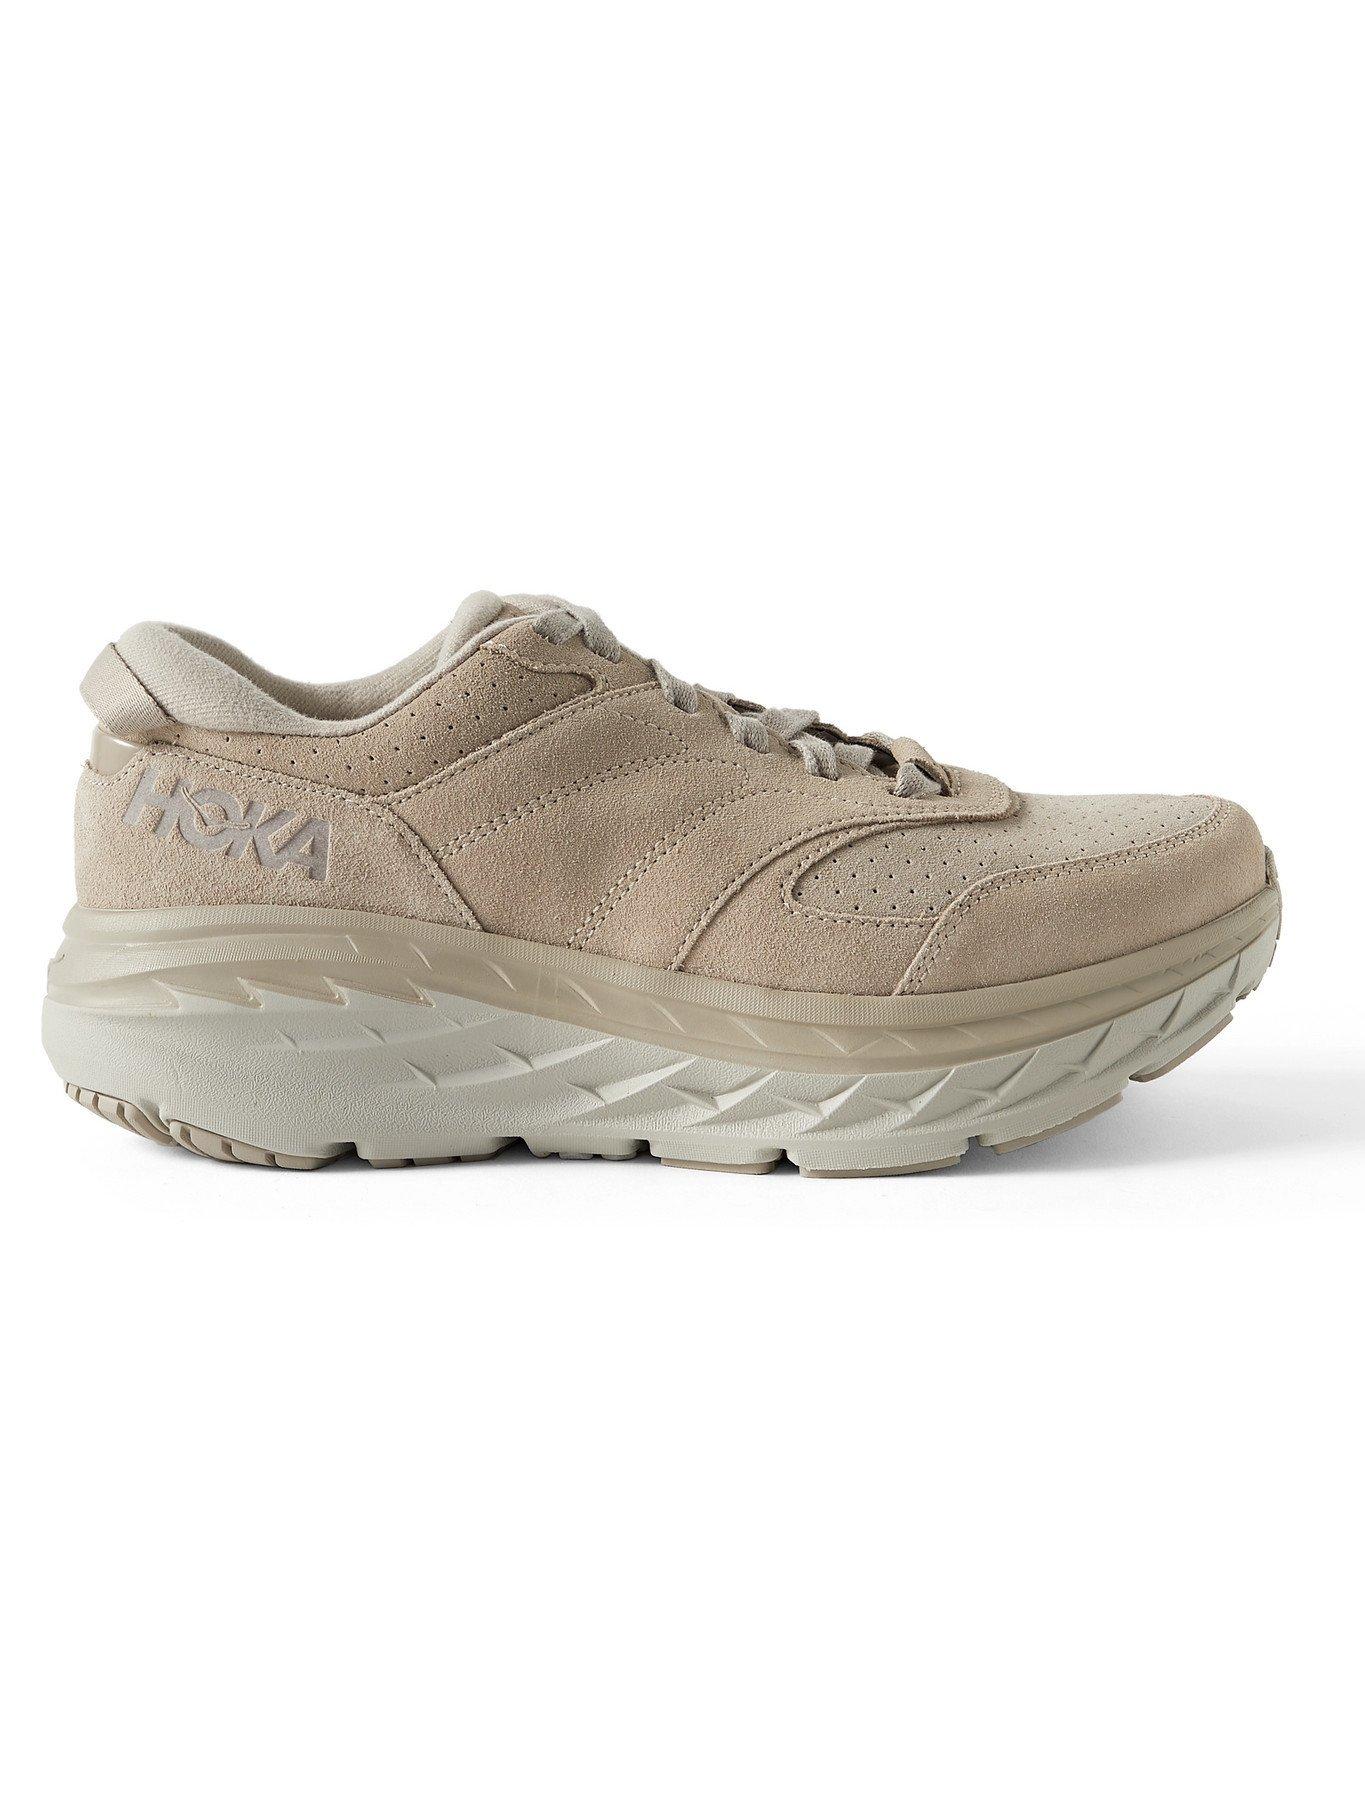 Photo: HOKA ONE ONE - Bondi L Suede Running Sneakers - Brown